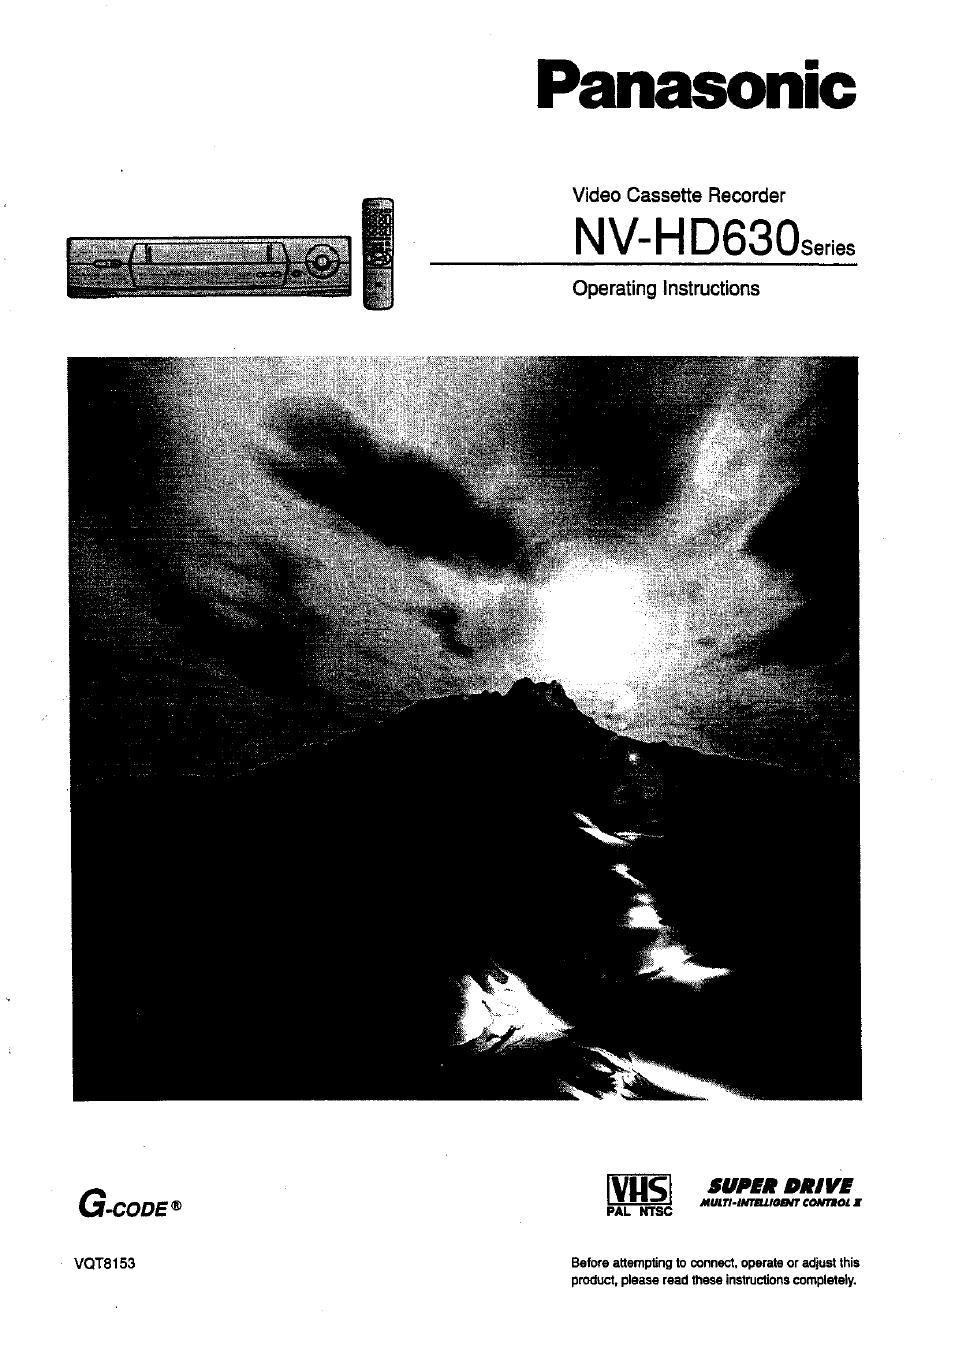 panasonic nv hd 630 user manual 40 pages rh manualsdir com panasonic m10 video camera manual panasonic video cassette recorder manual